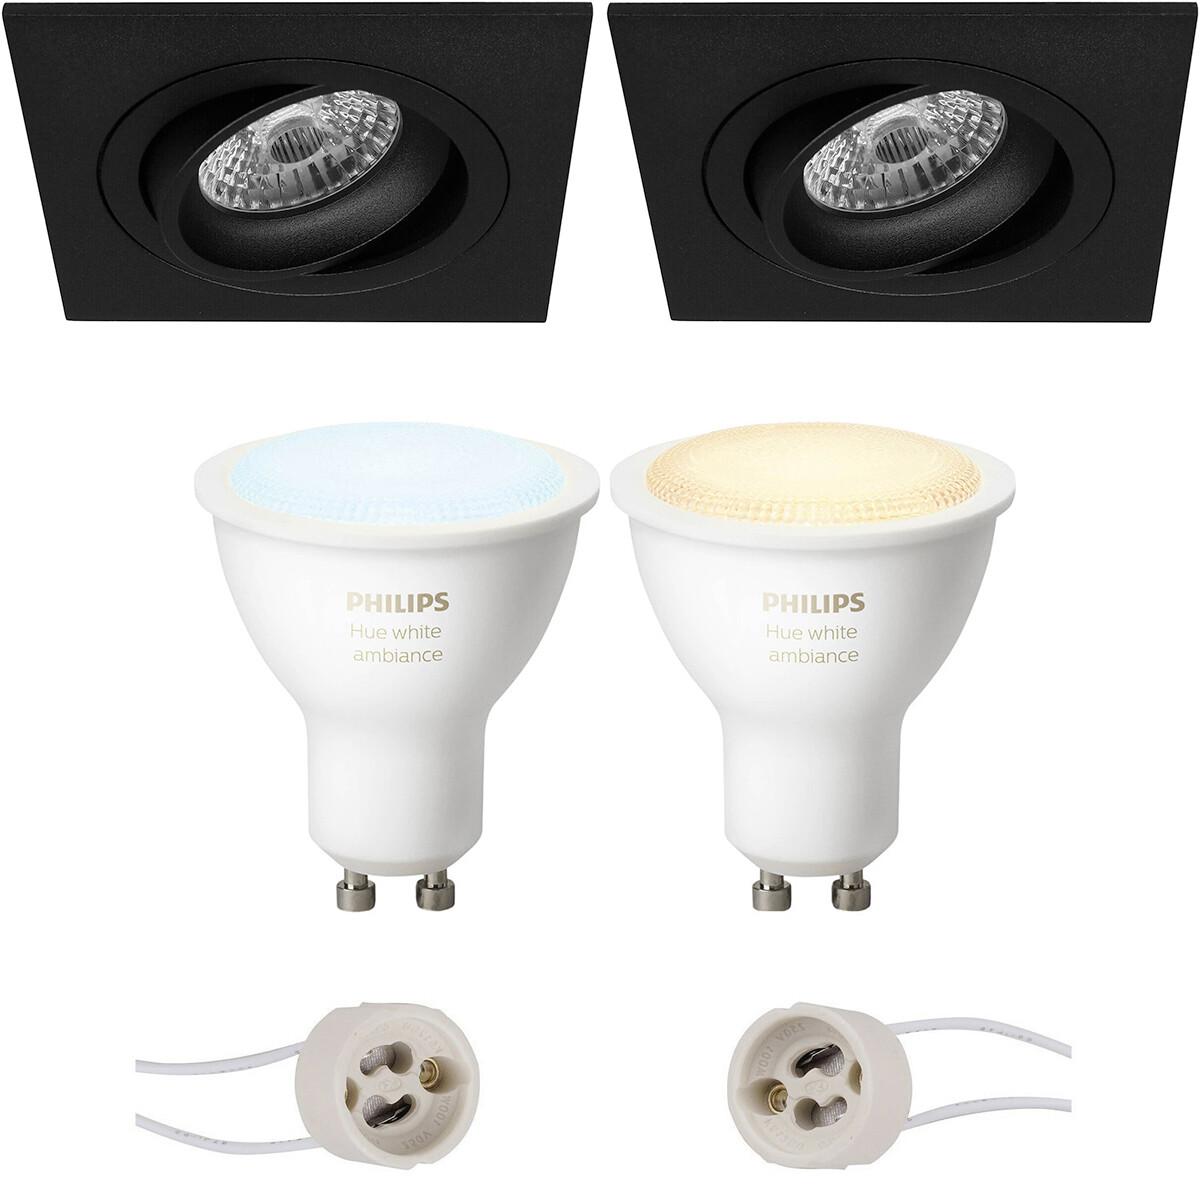 Pragmi Borny Pro - Inbouw Vierkant - Mat Zwart - Kantelbaar - 92mm - Philips Hue - LED Spot Set GU10